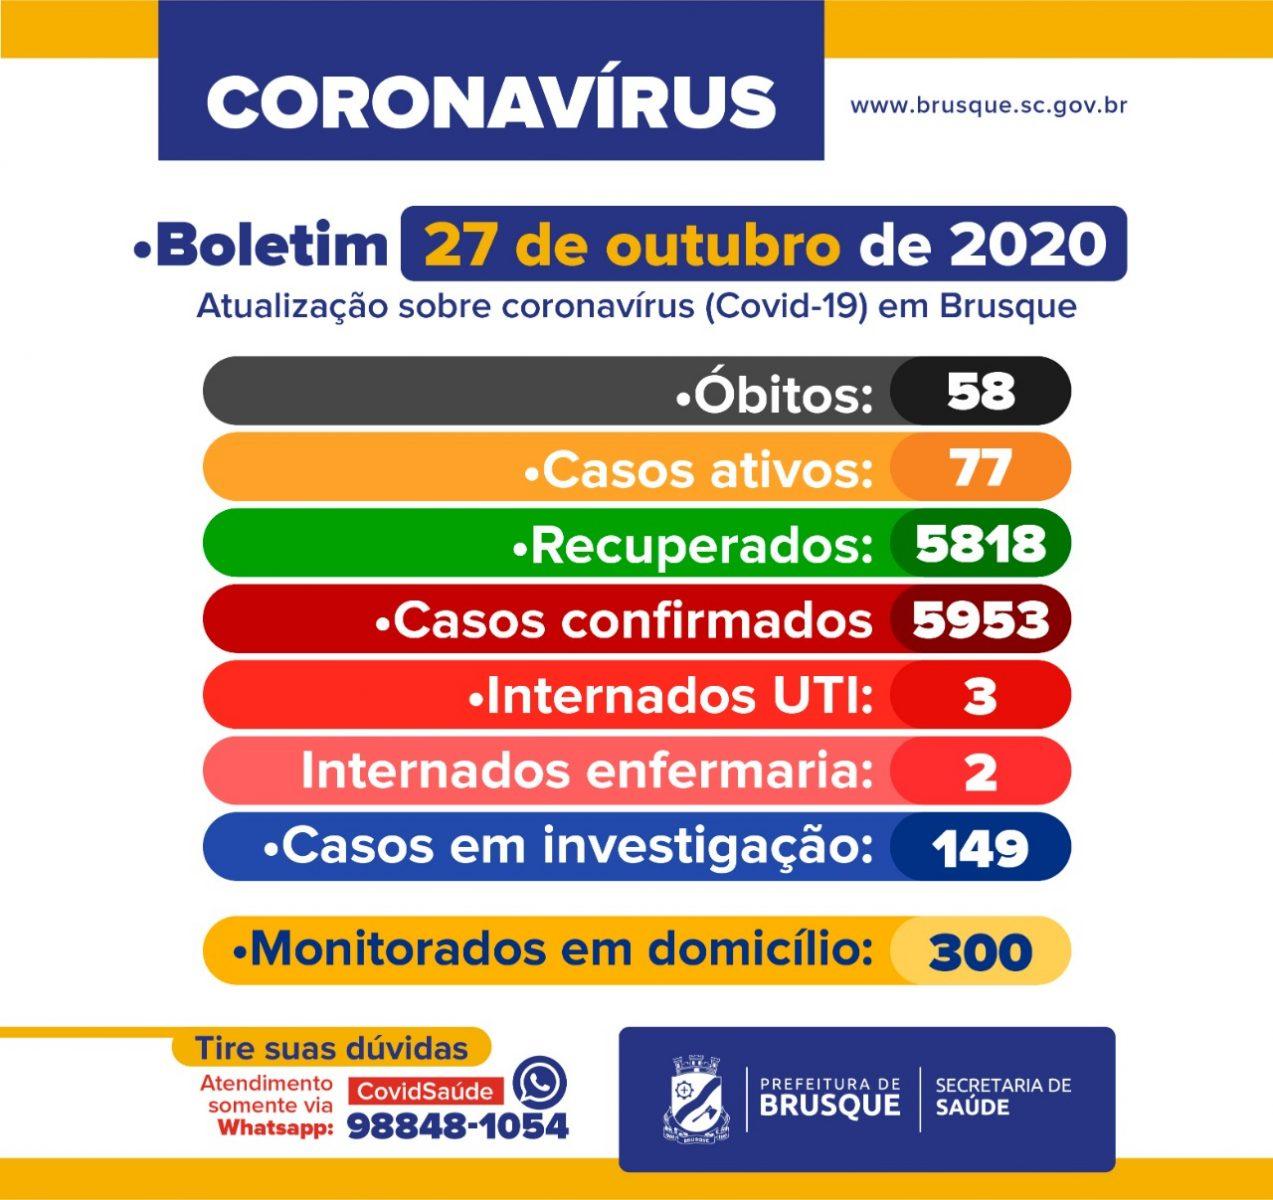 Boletim Epidemiológico de terça-feira, 27 de outubro